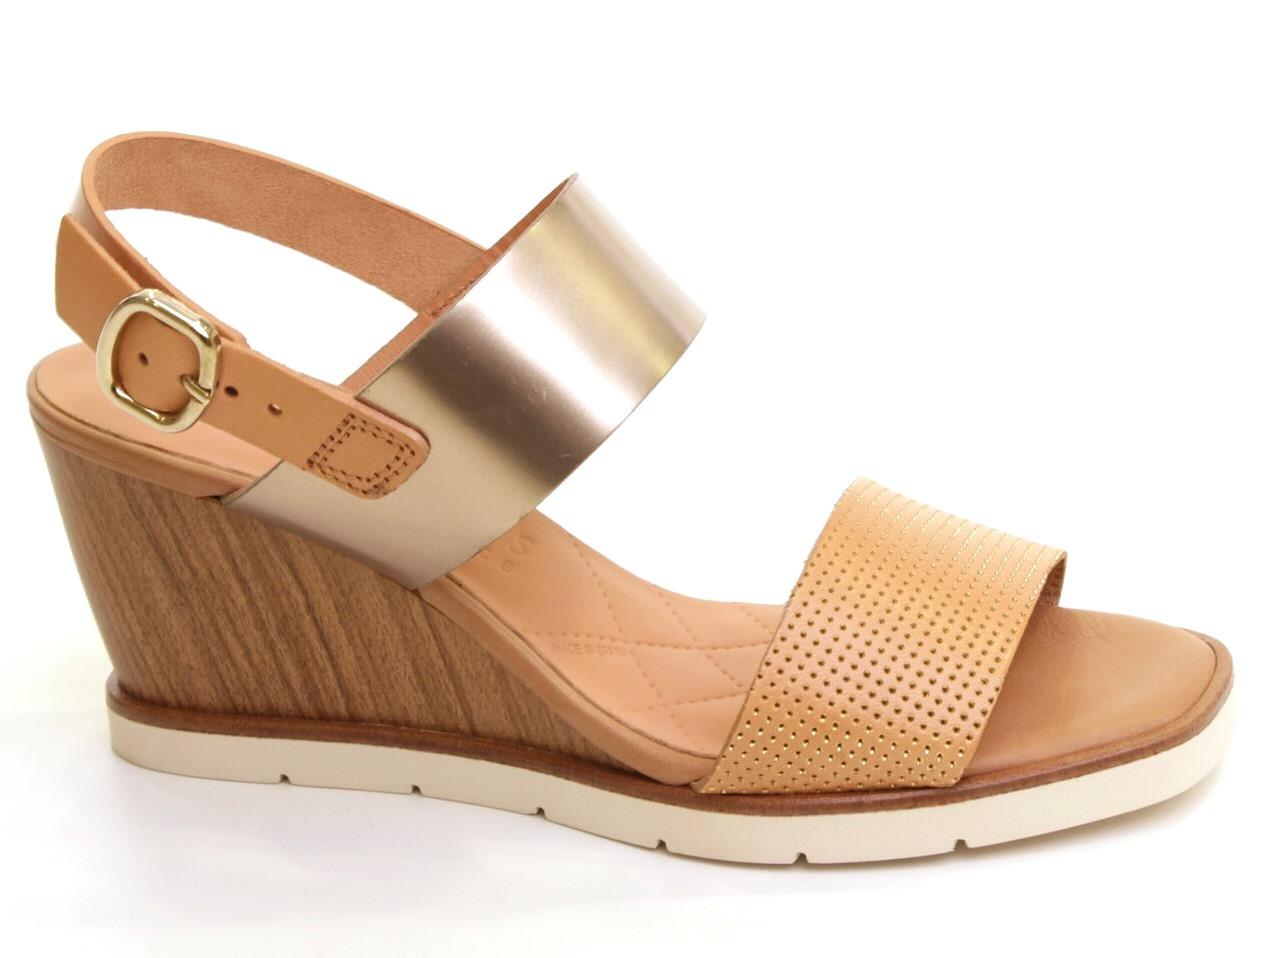 Wedge Sandals Hispanitas - 165 CHV62854